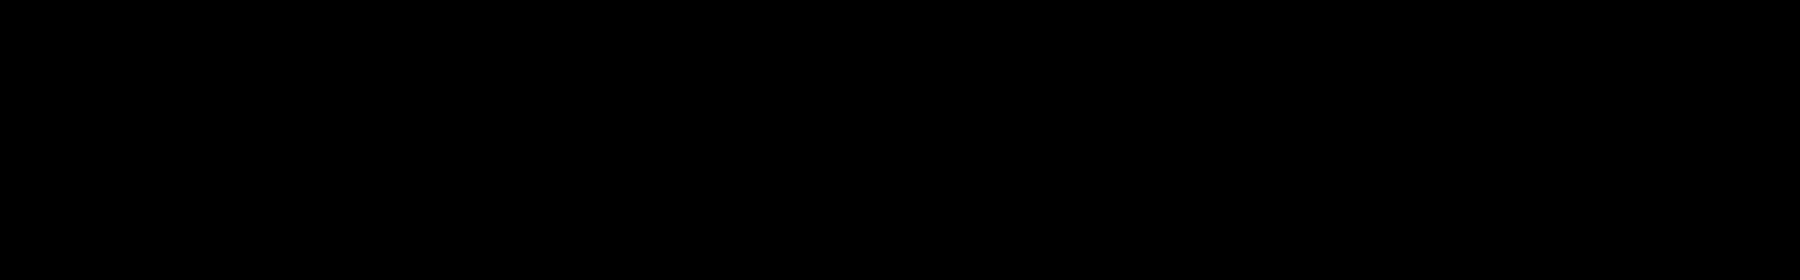 Melodic Lo-Fi Worx audio waveform